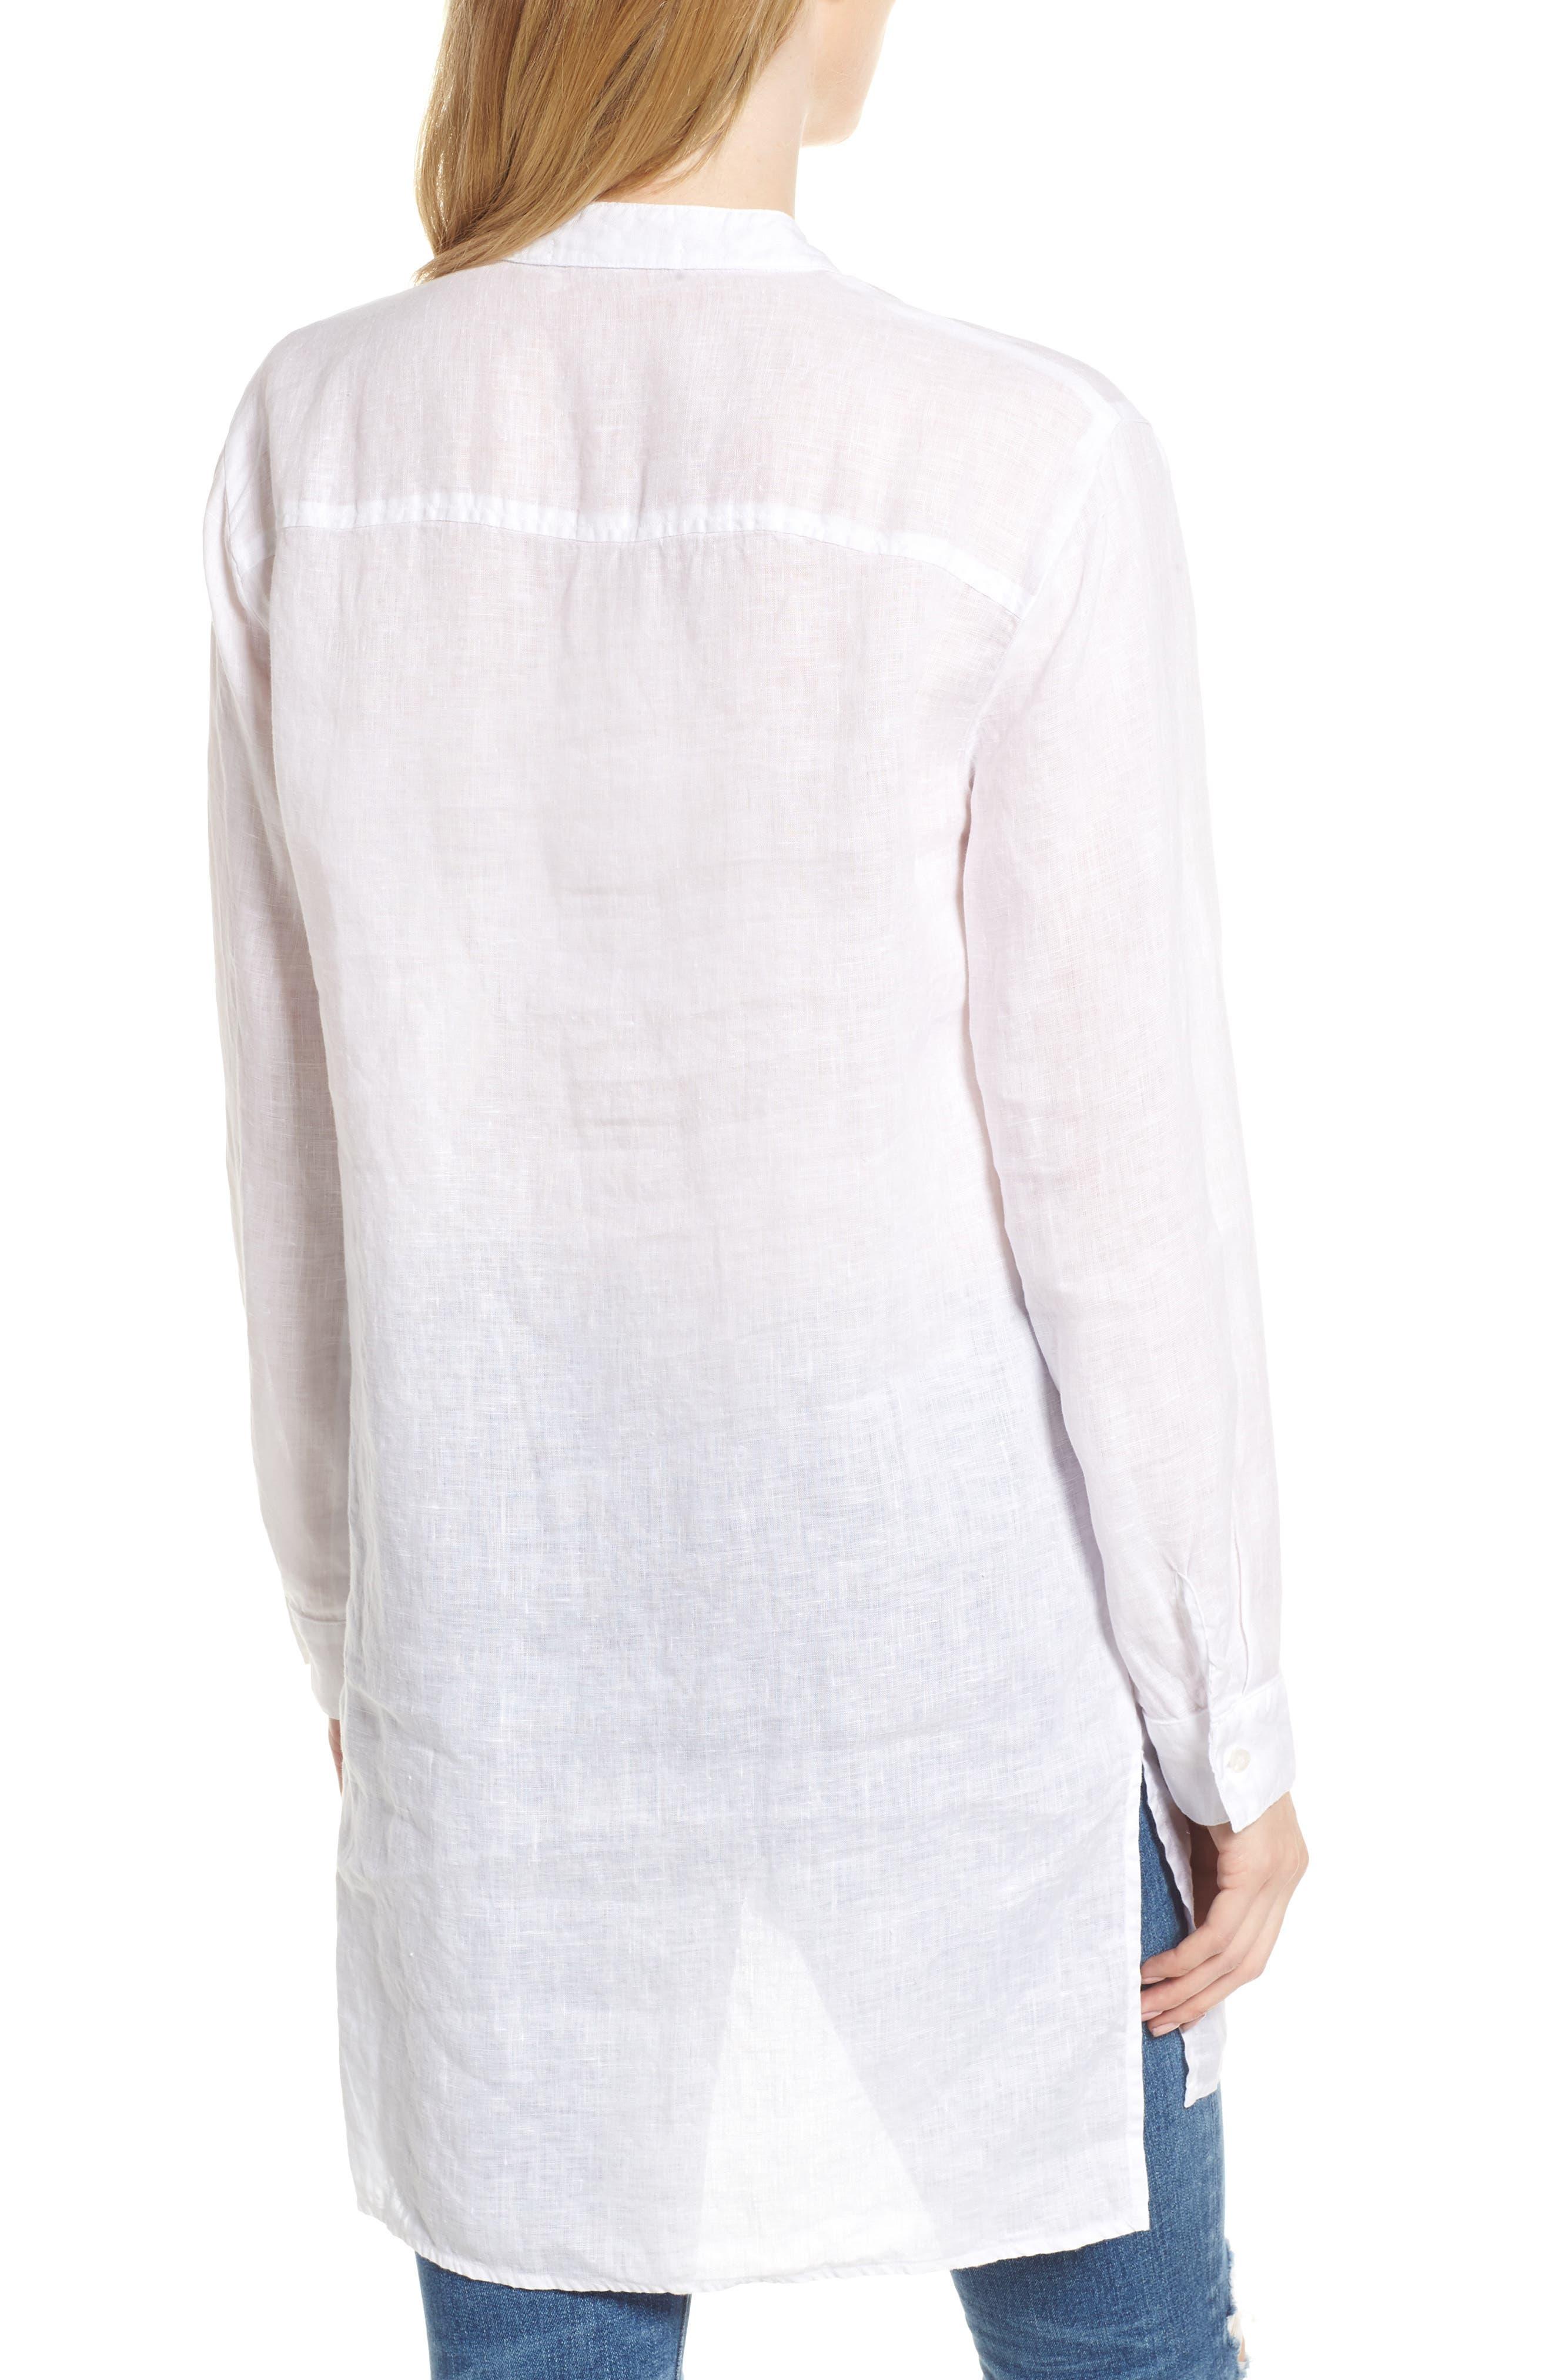 Shirting Tunic Top,                             Alternate thumbnail 2, color,                             White